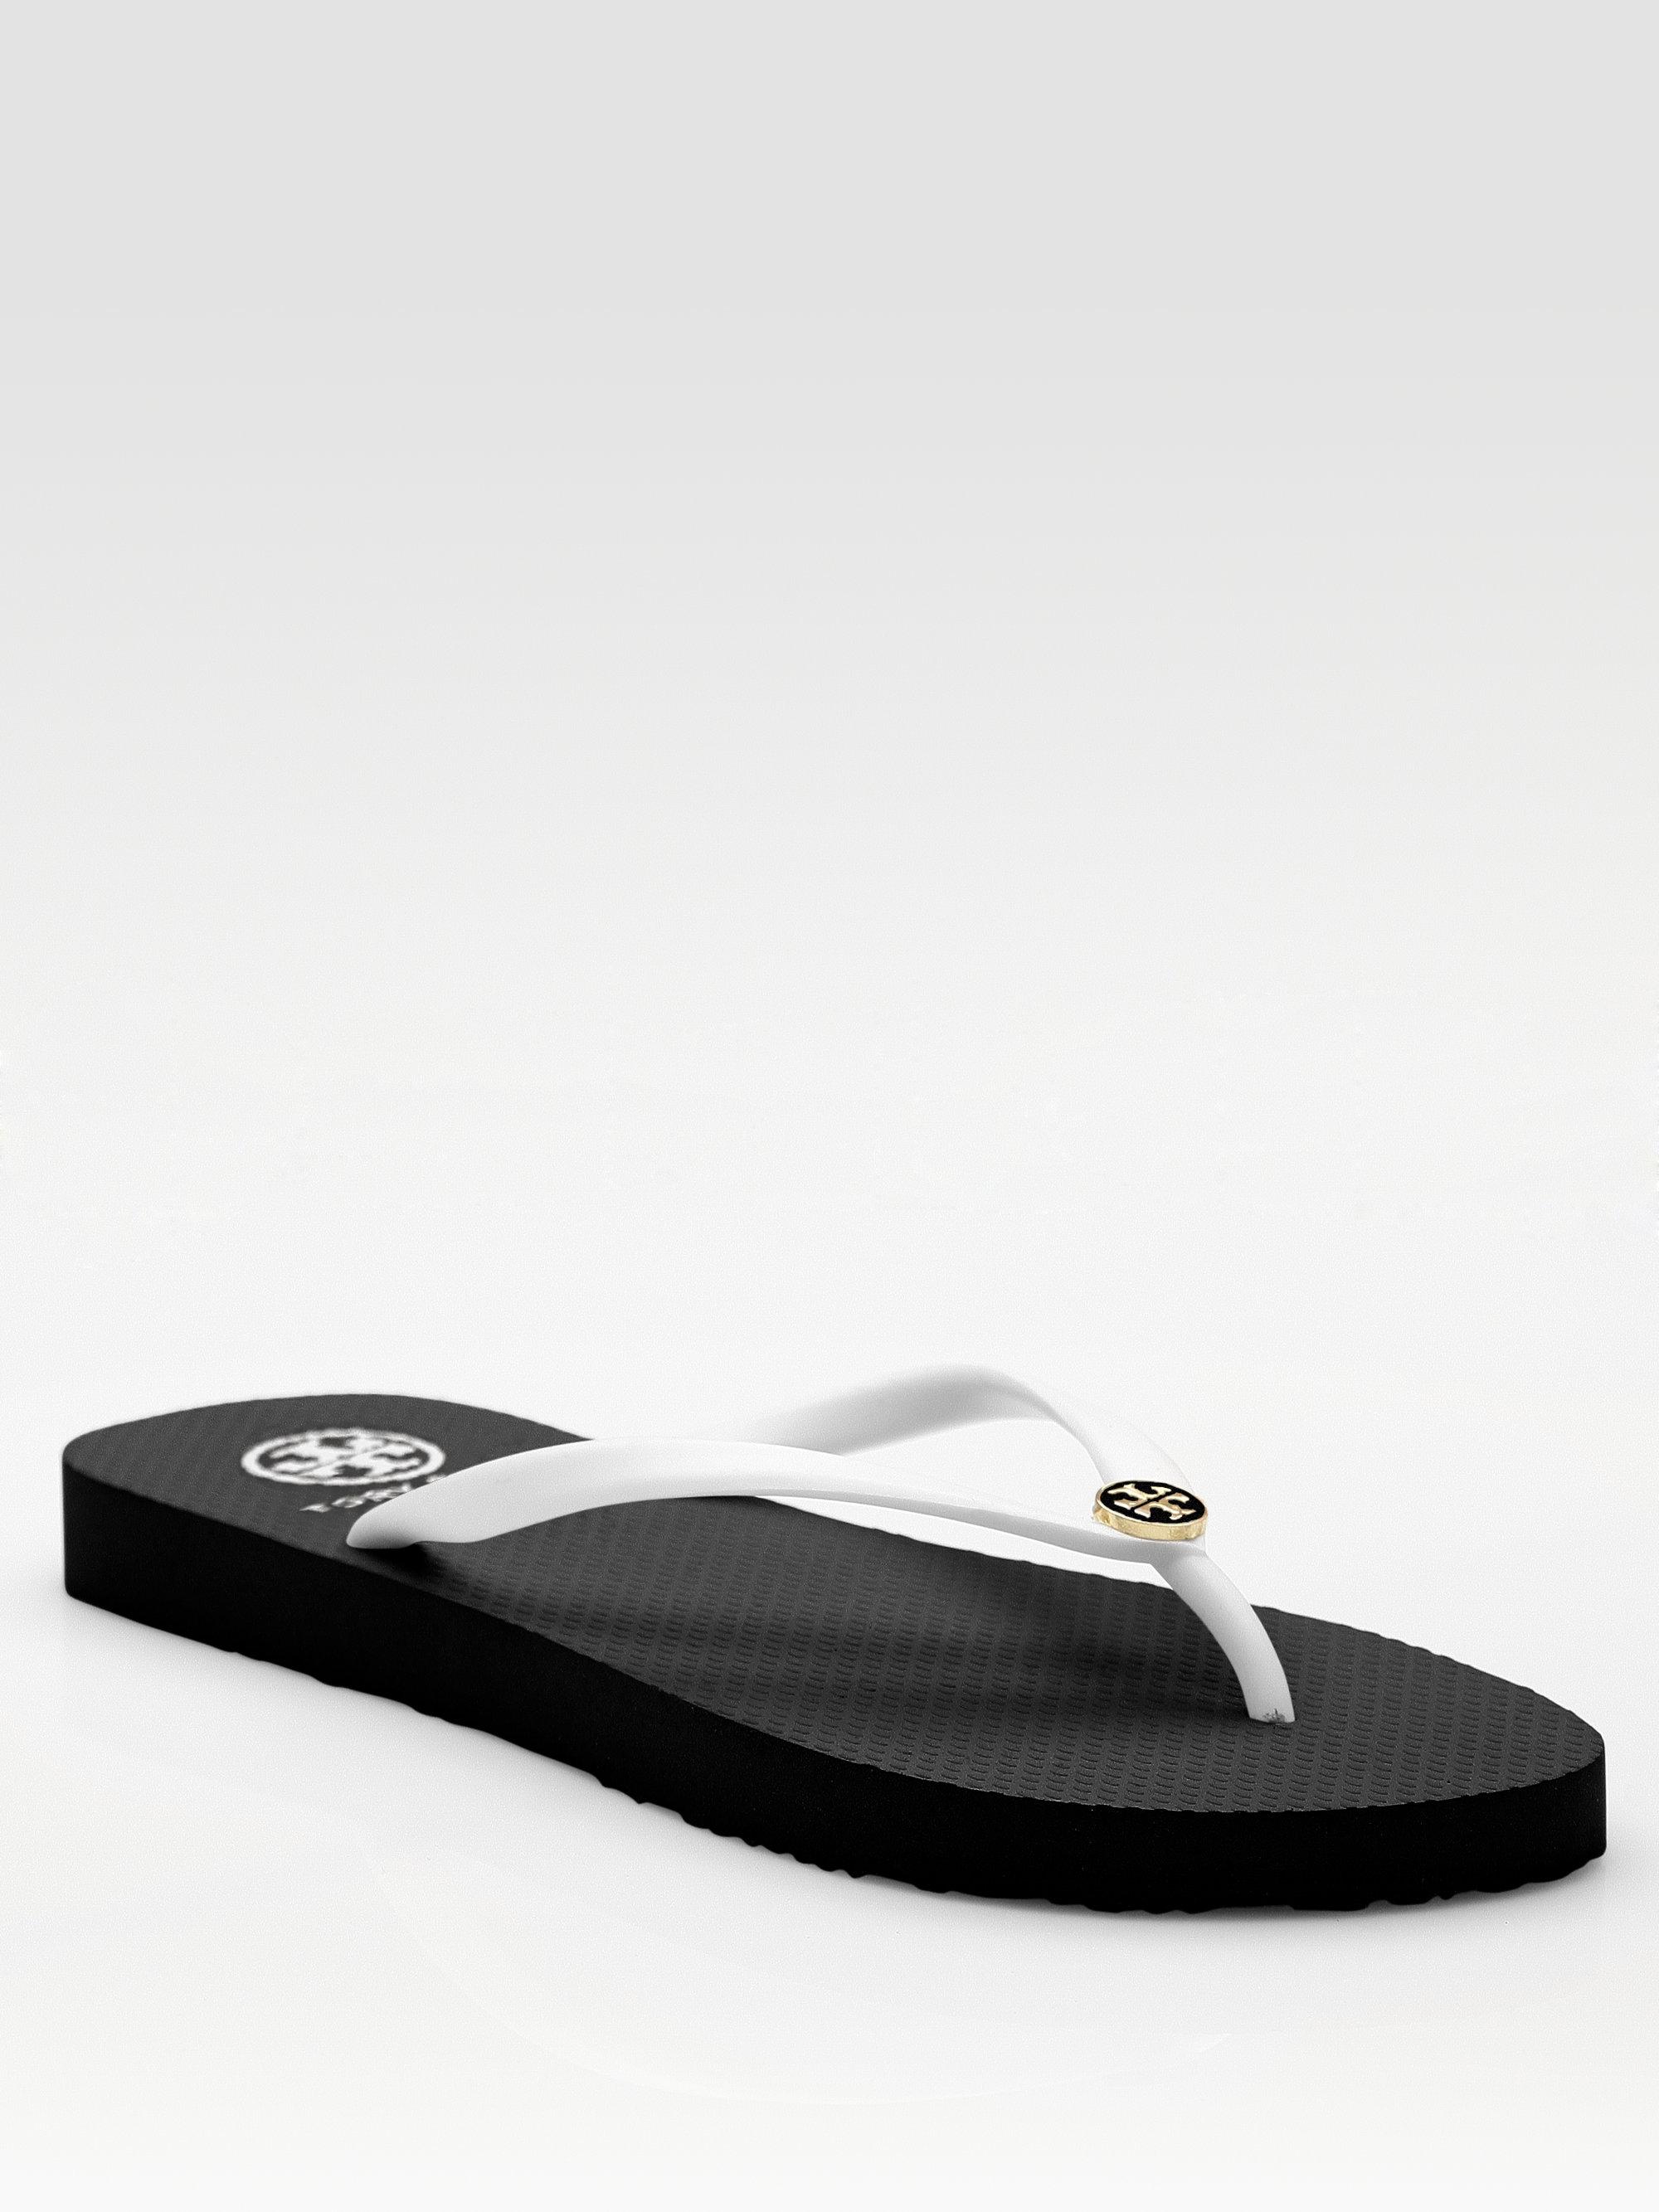 Tory Burch Thin Flip Flops In White White Khaki Lyst